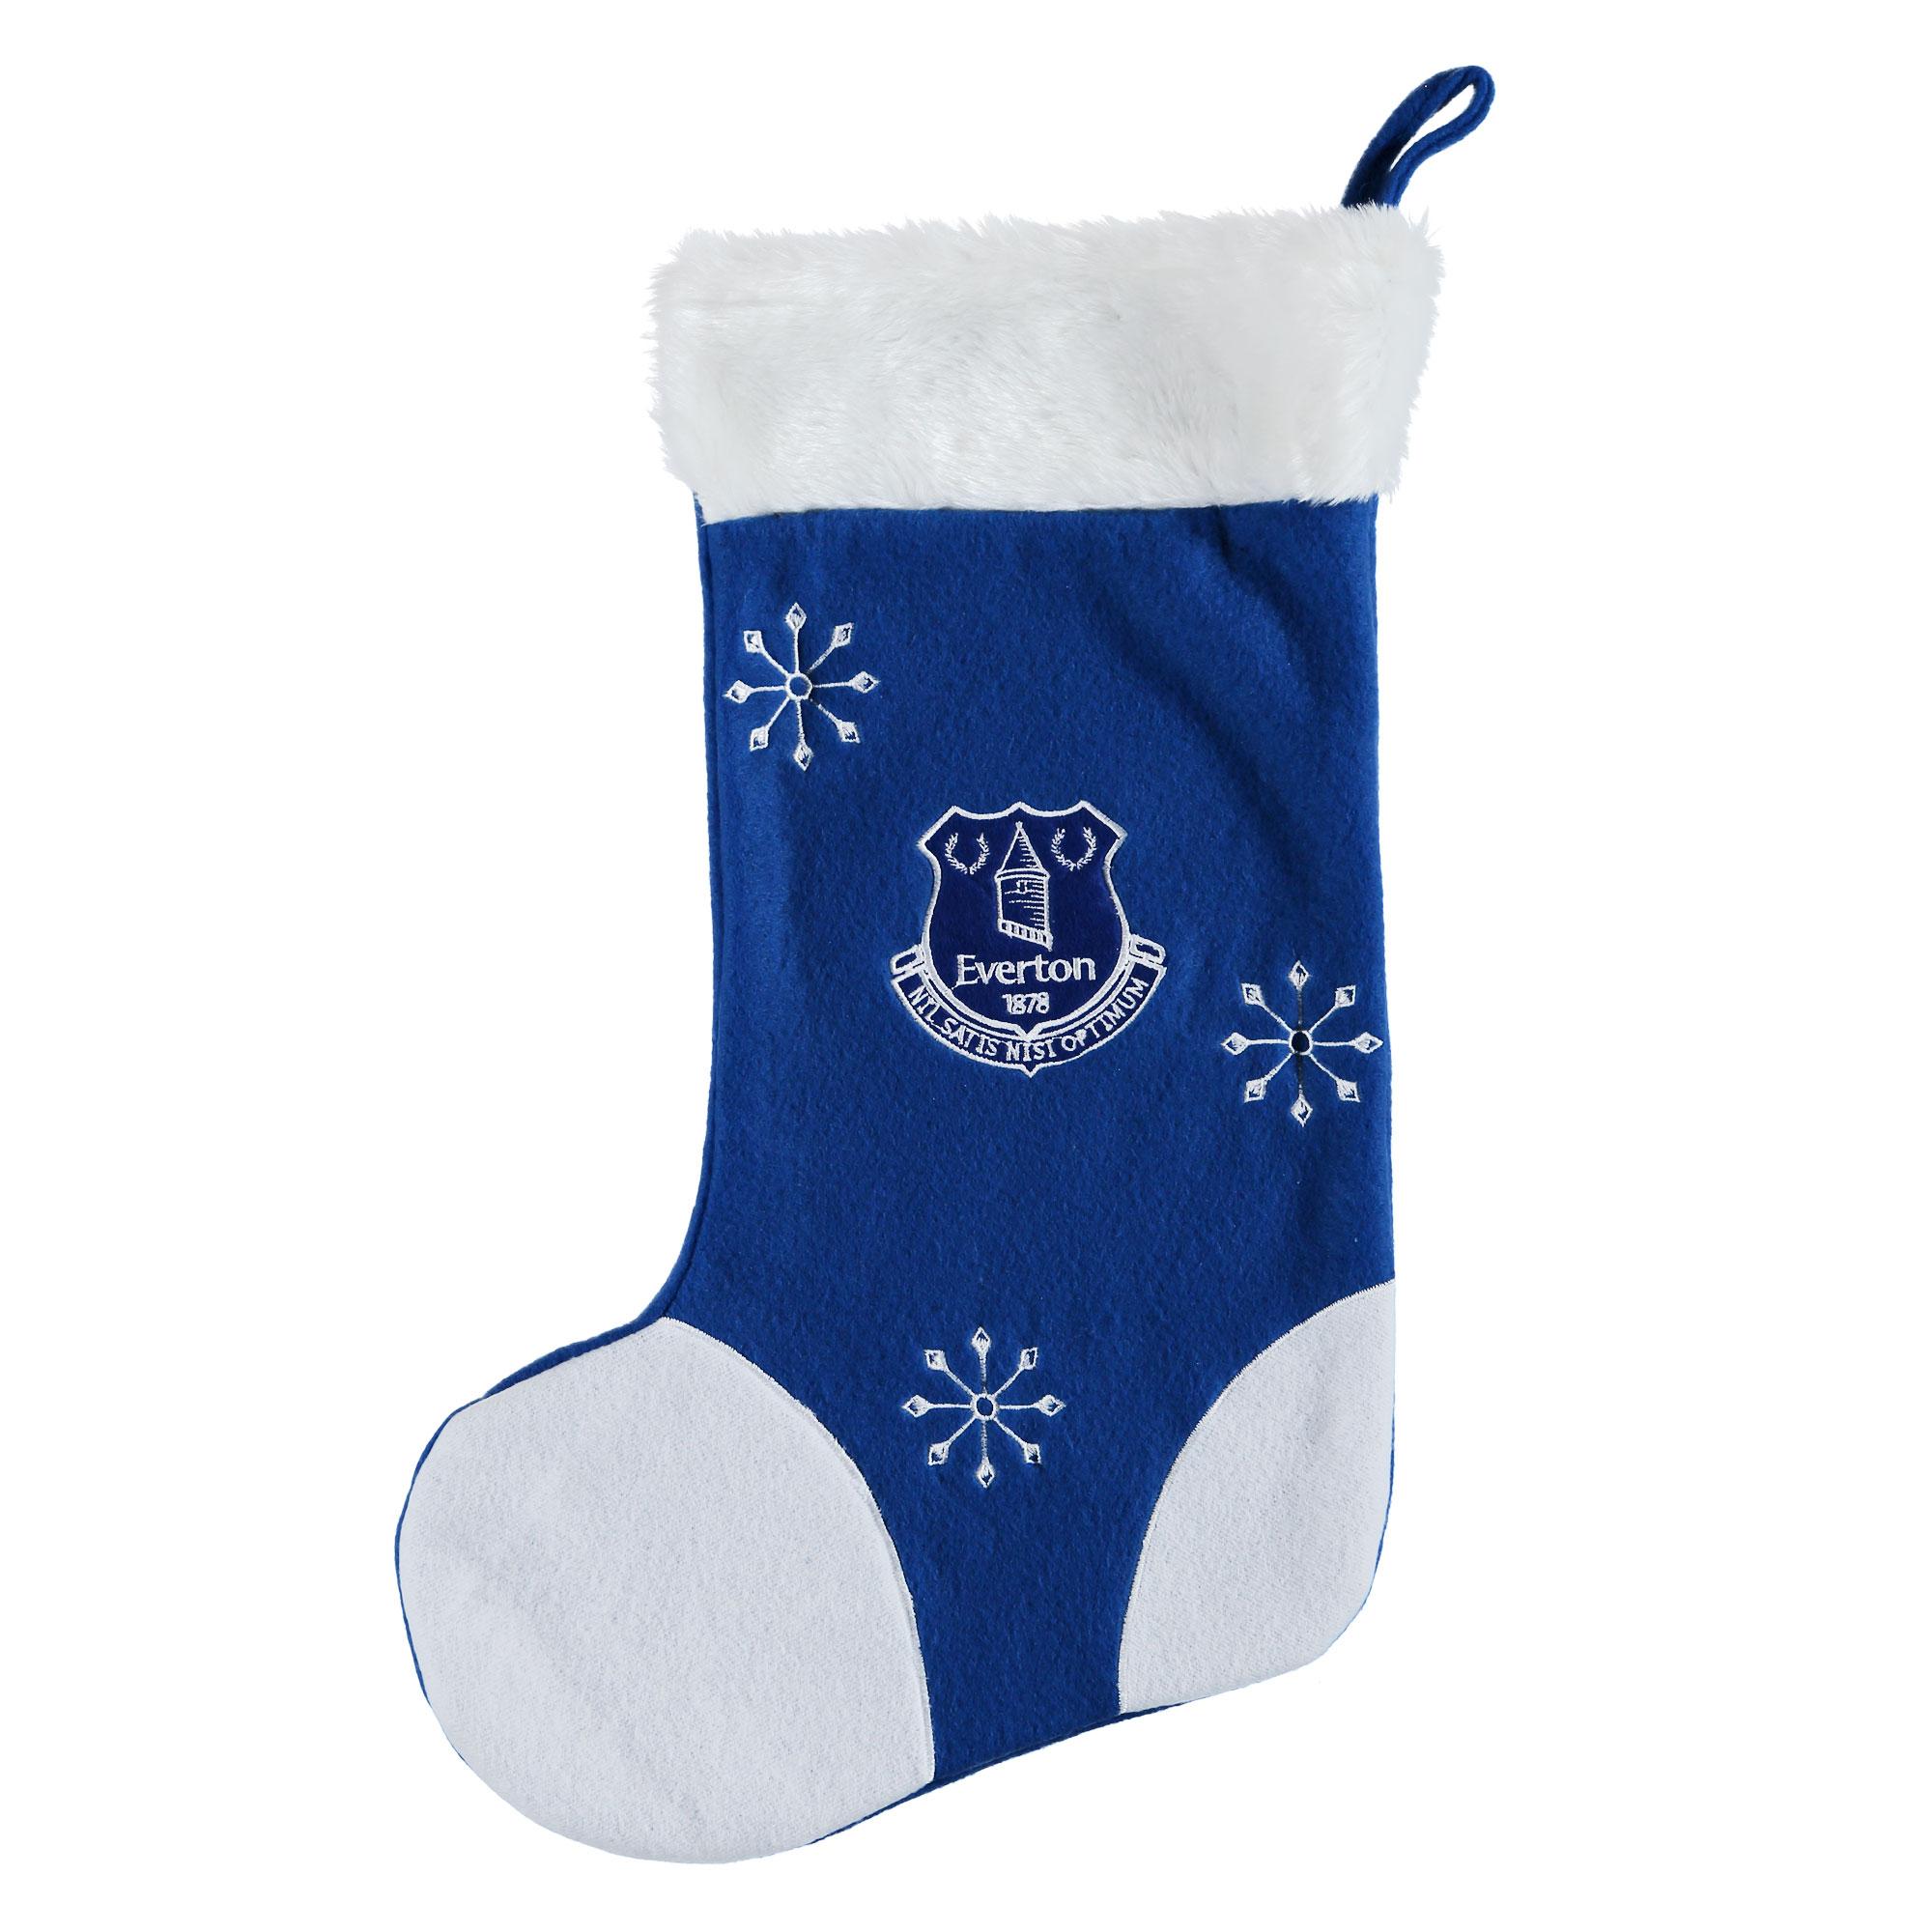 Image of Everton Christmas Stocking